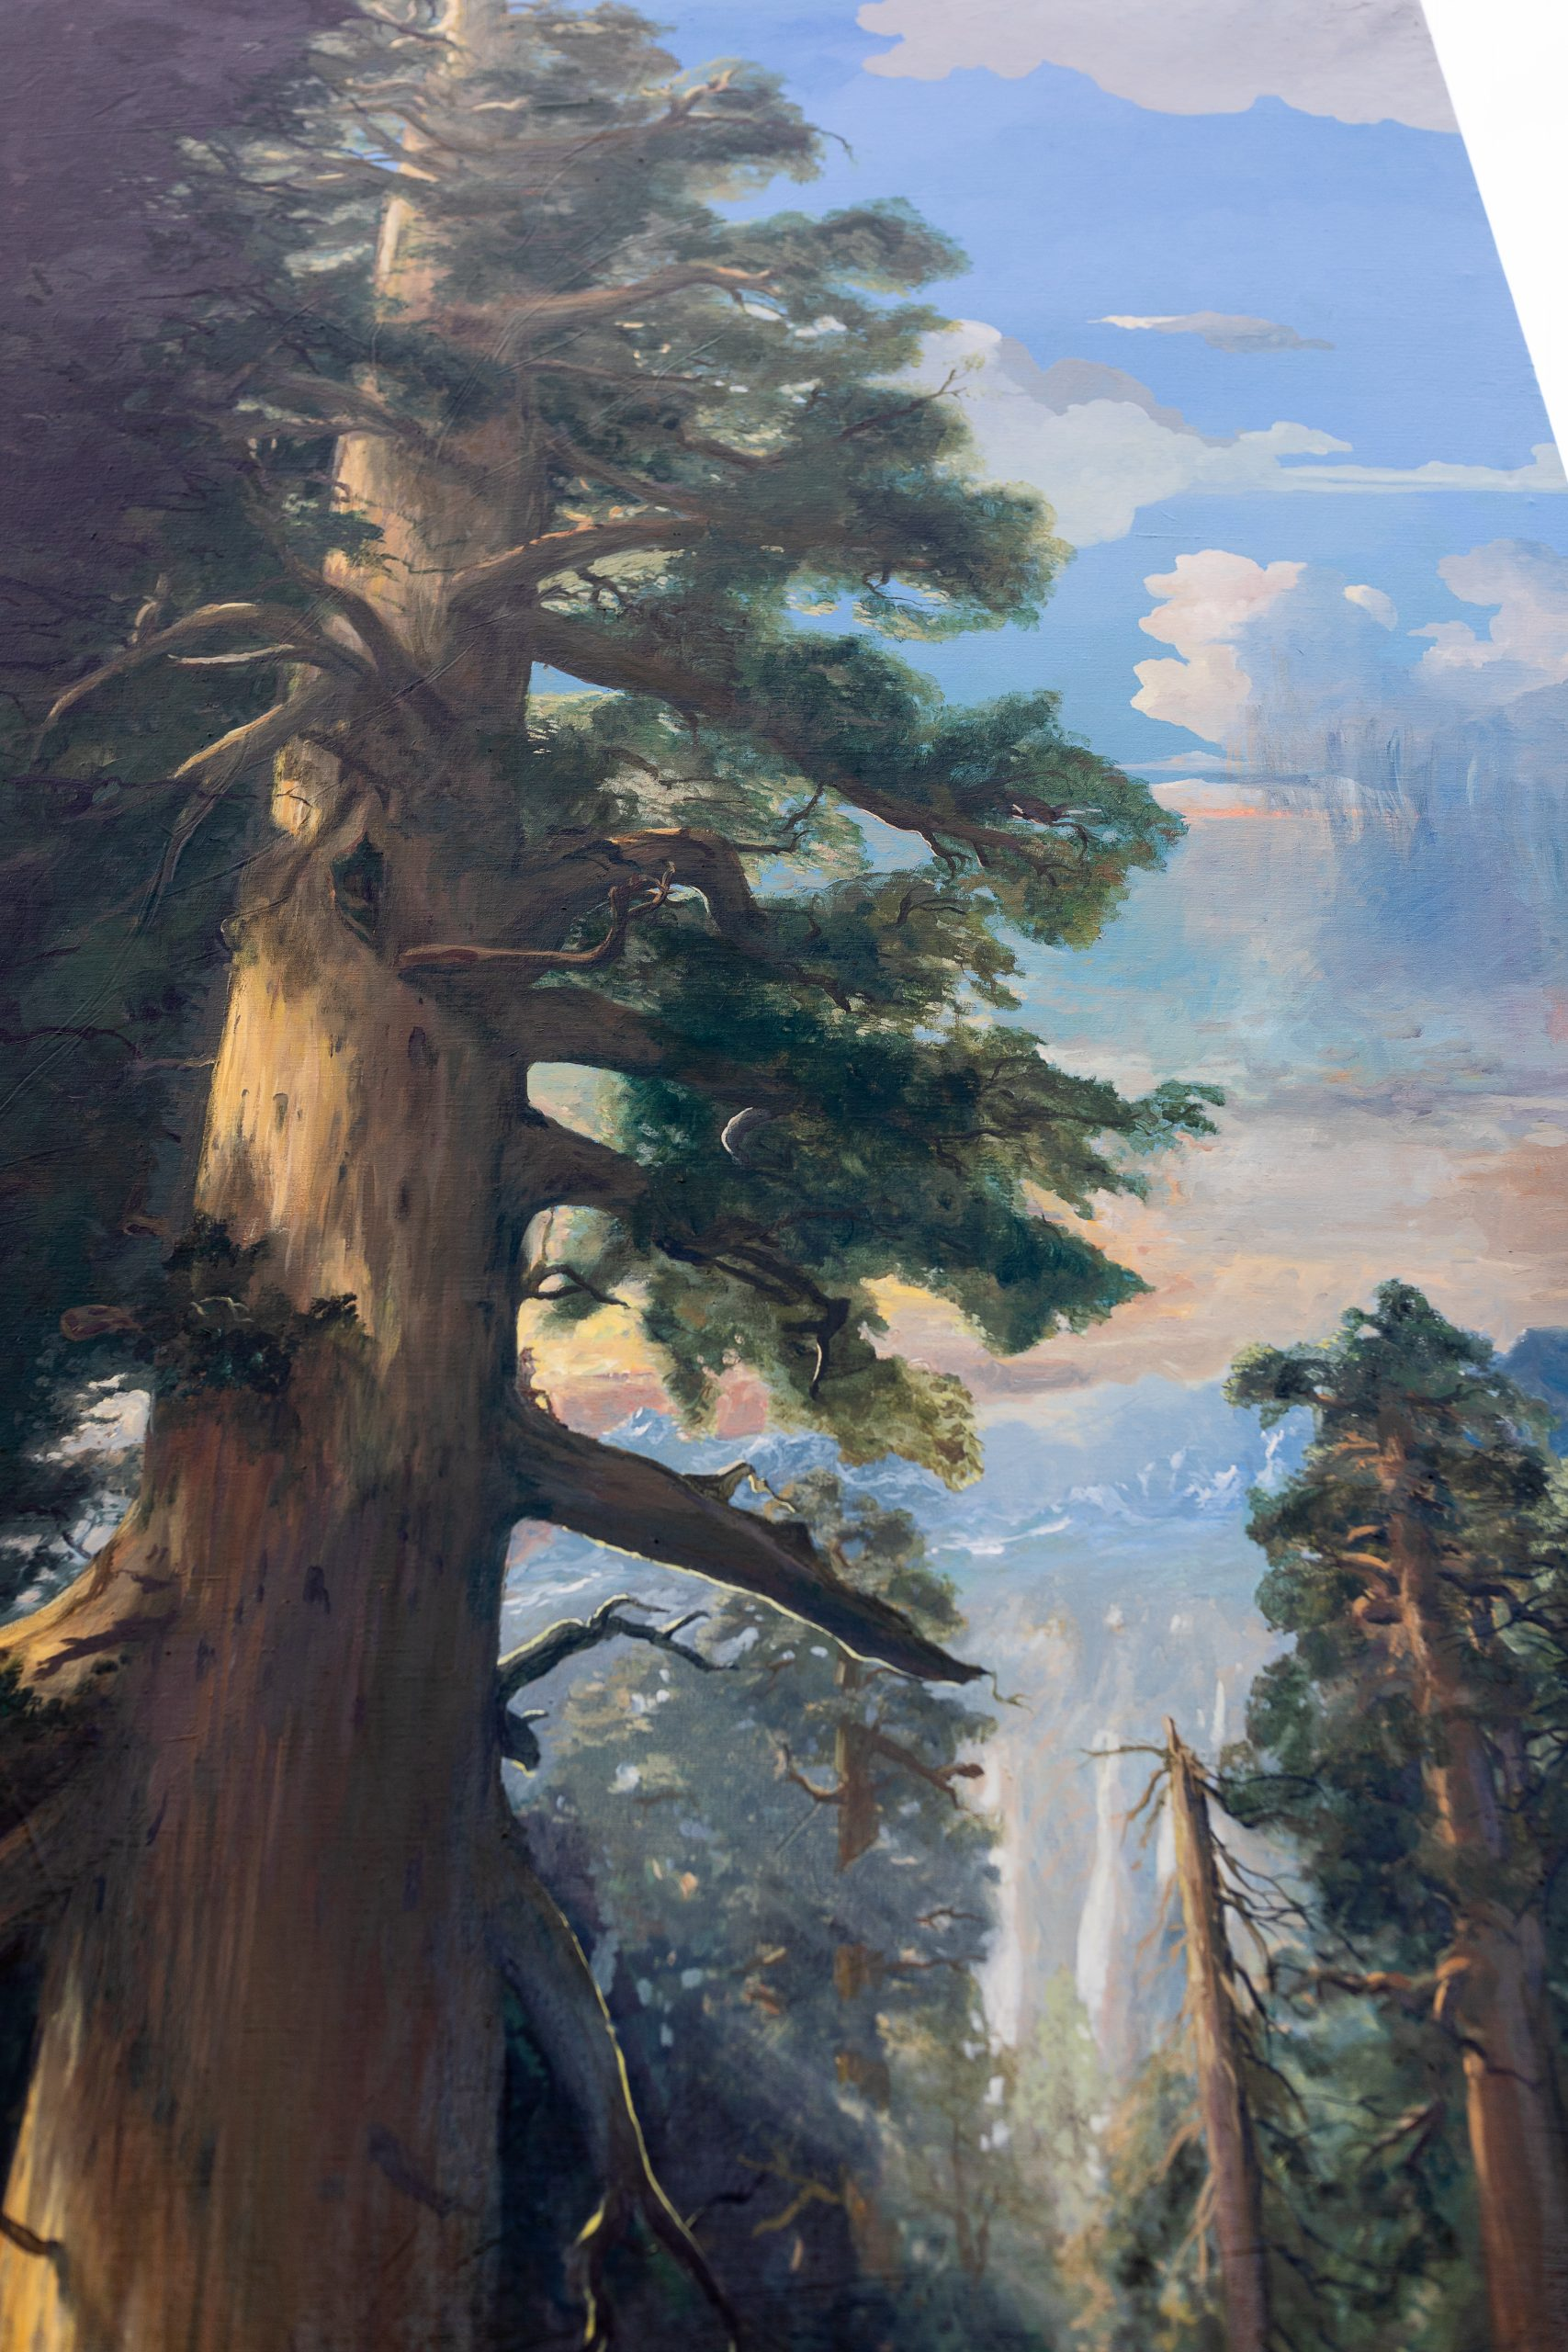 Huge Custom Giant Sequoia Oil Painting